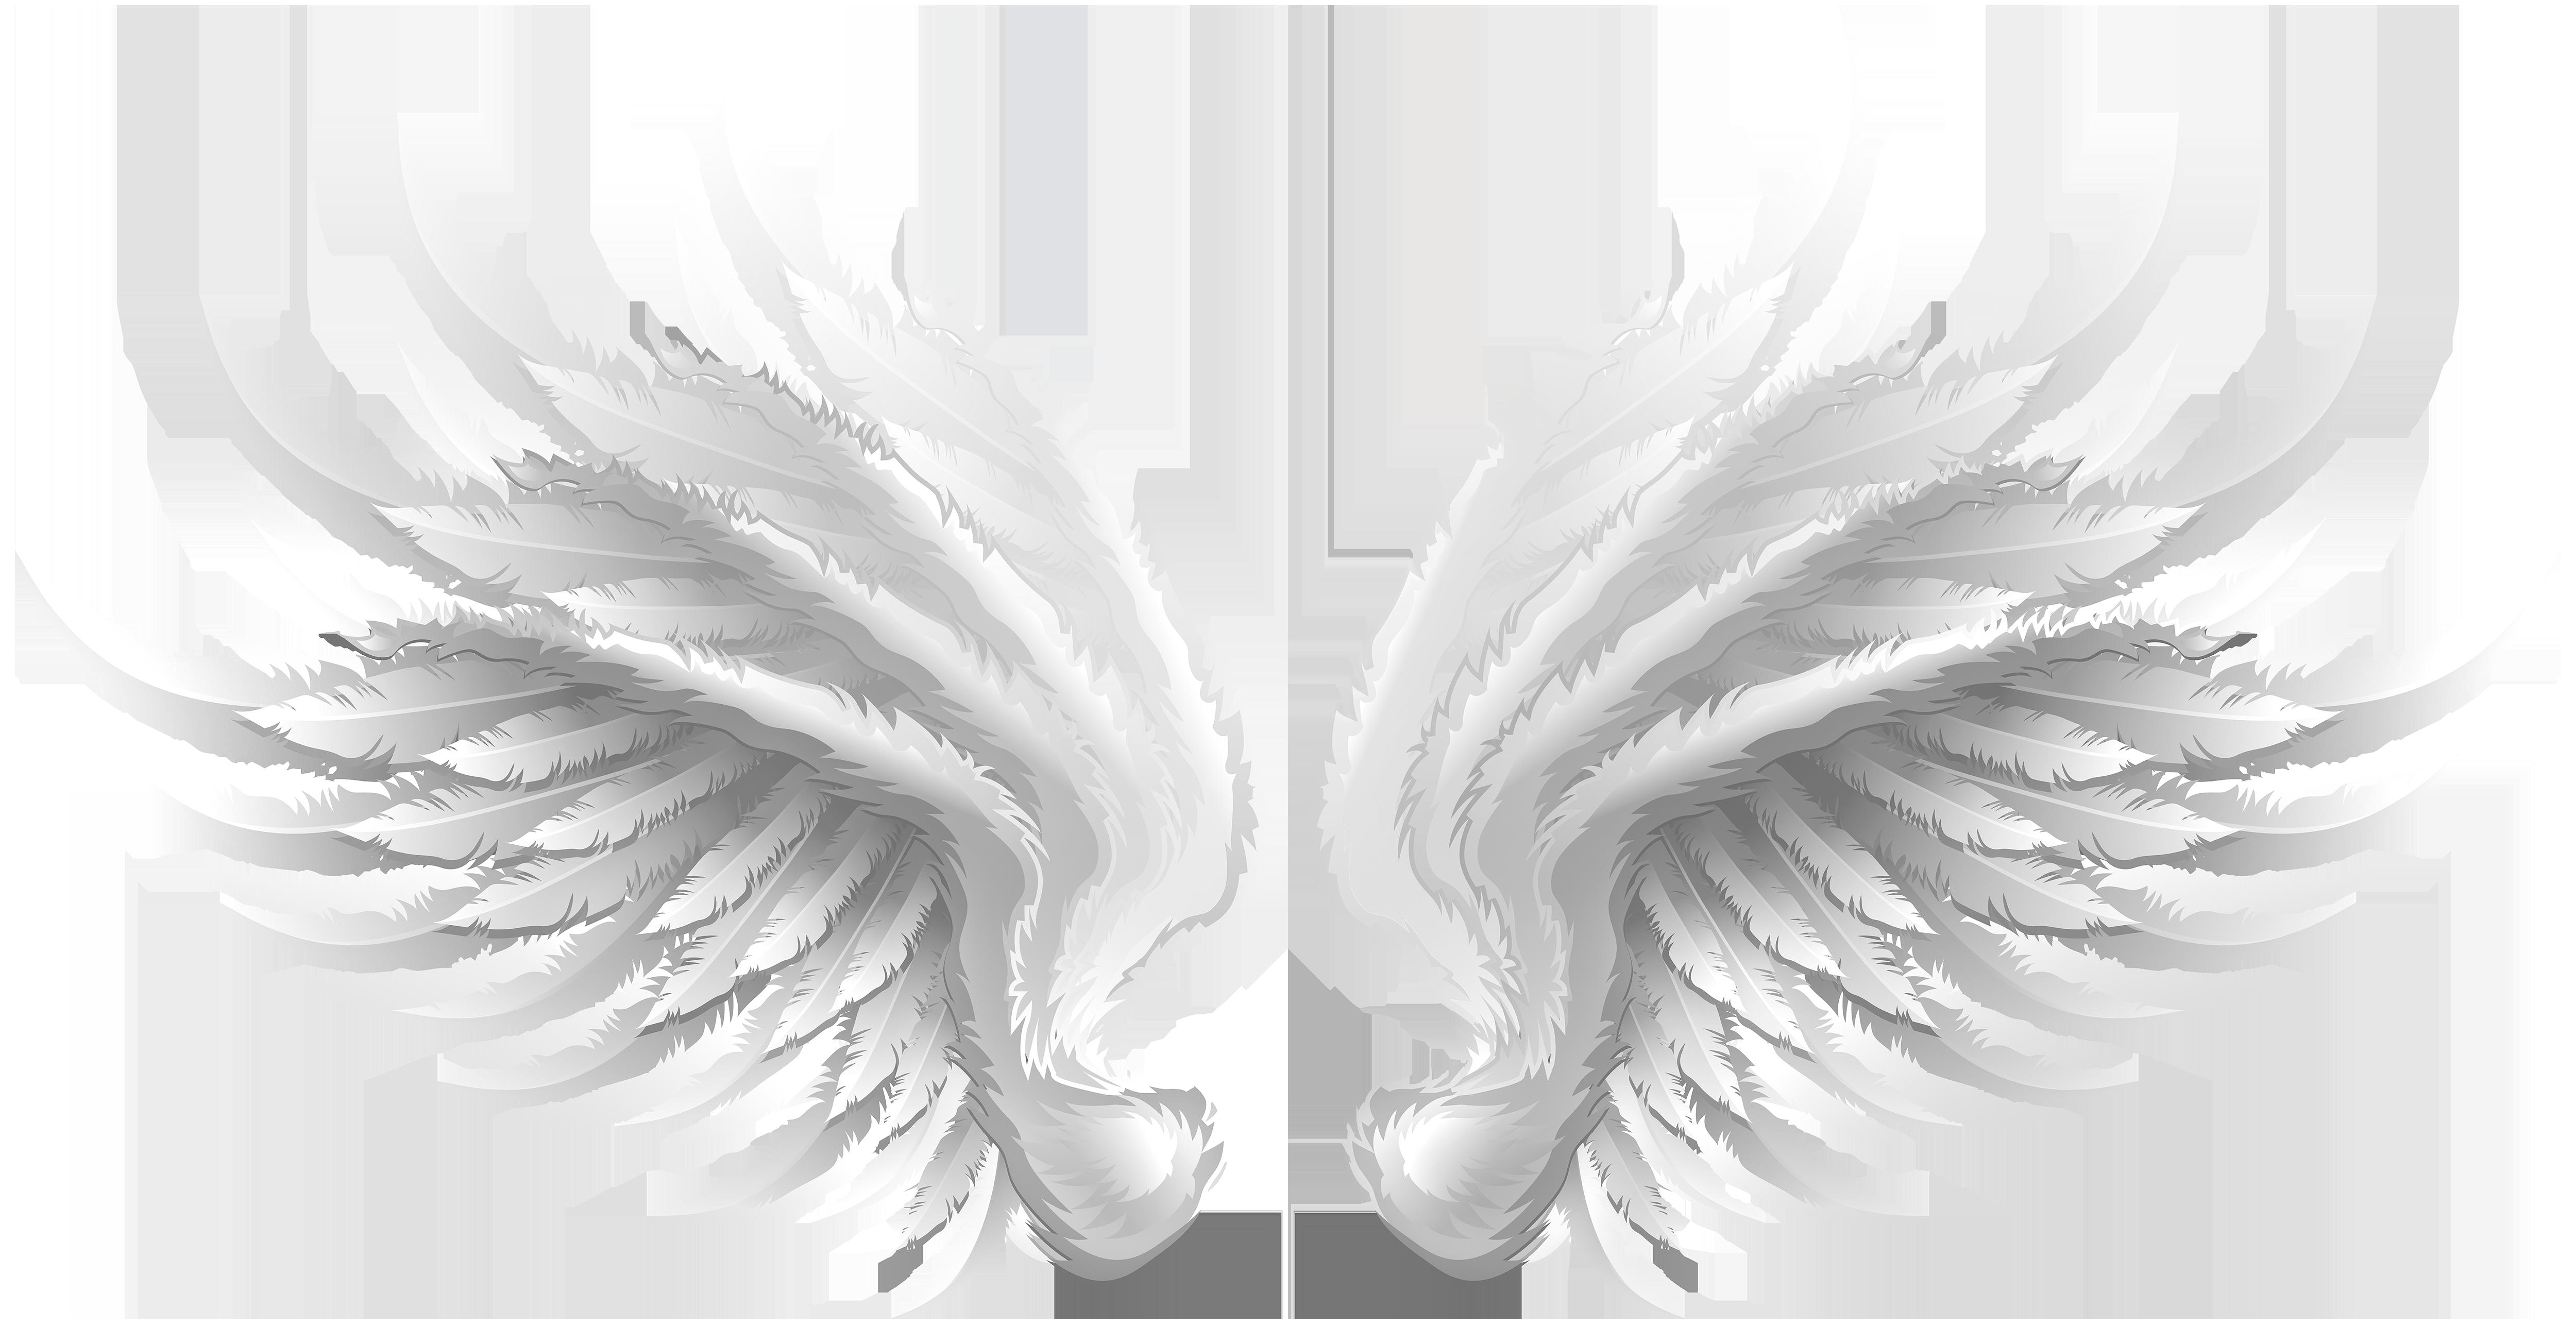 White Wings Transparent Clip Art Image.